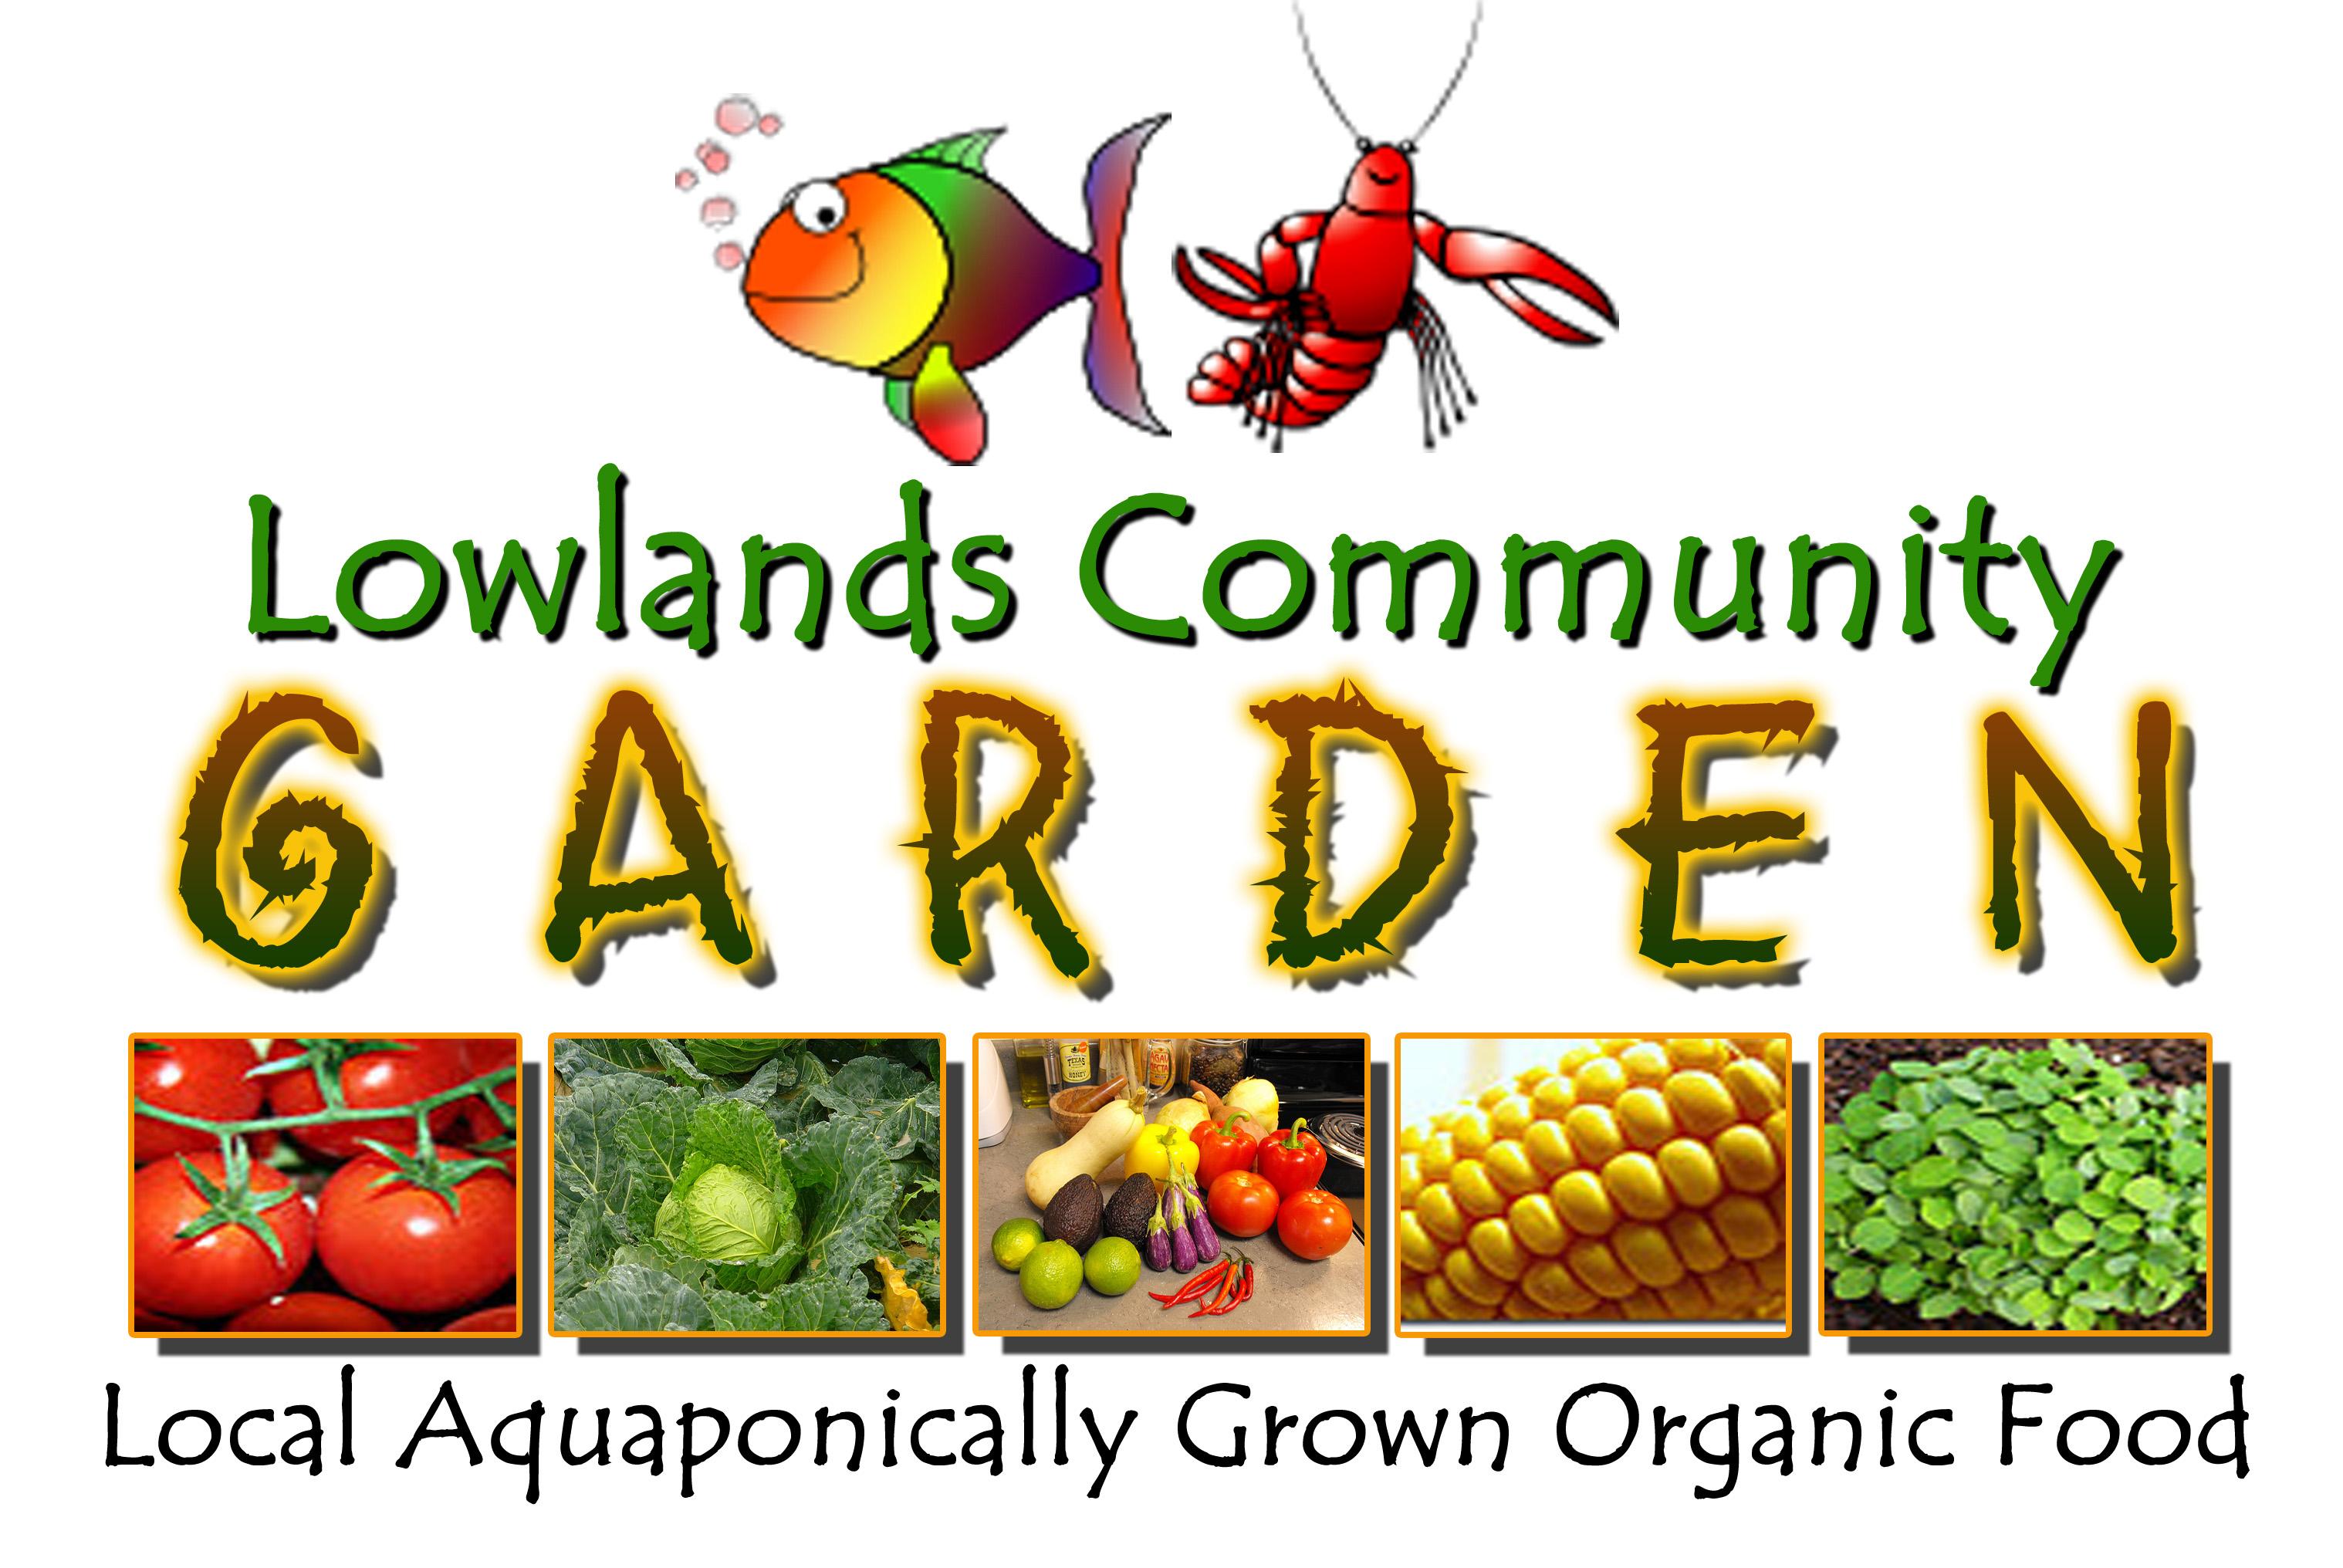 Introducing the Lowlands Community Garden